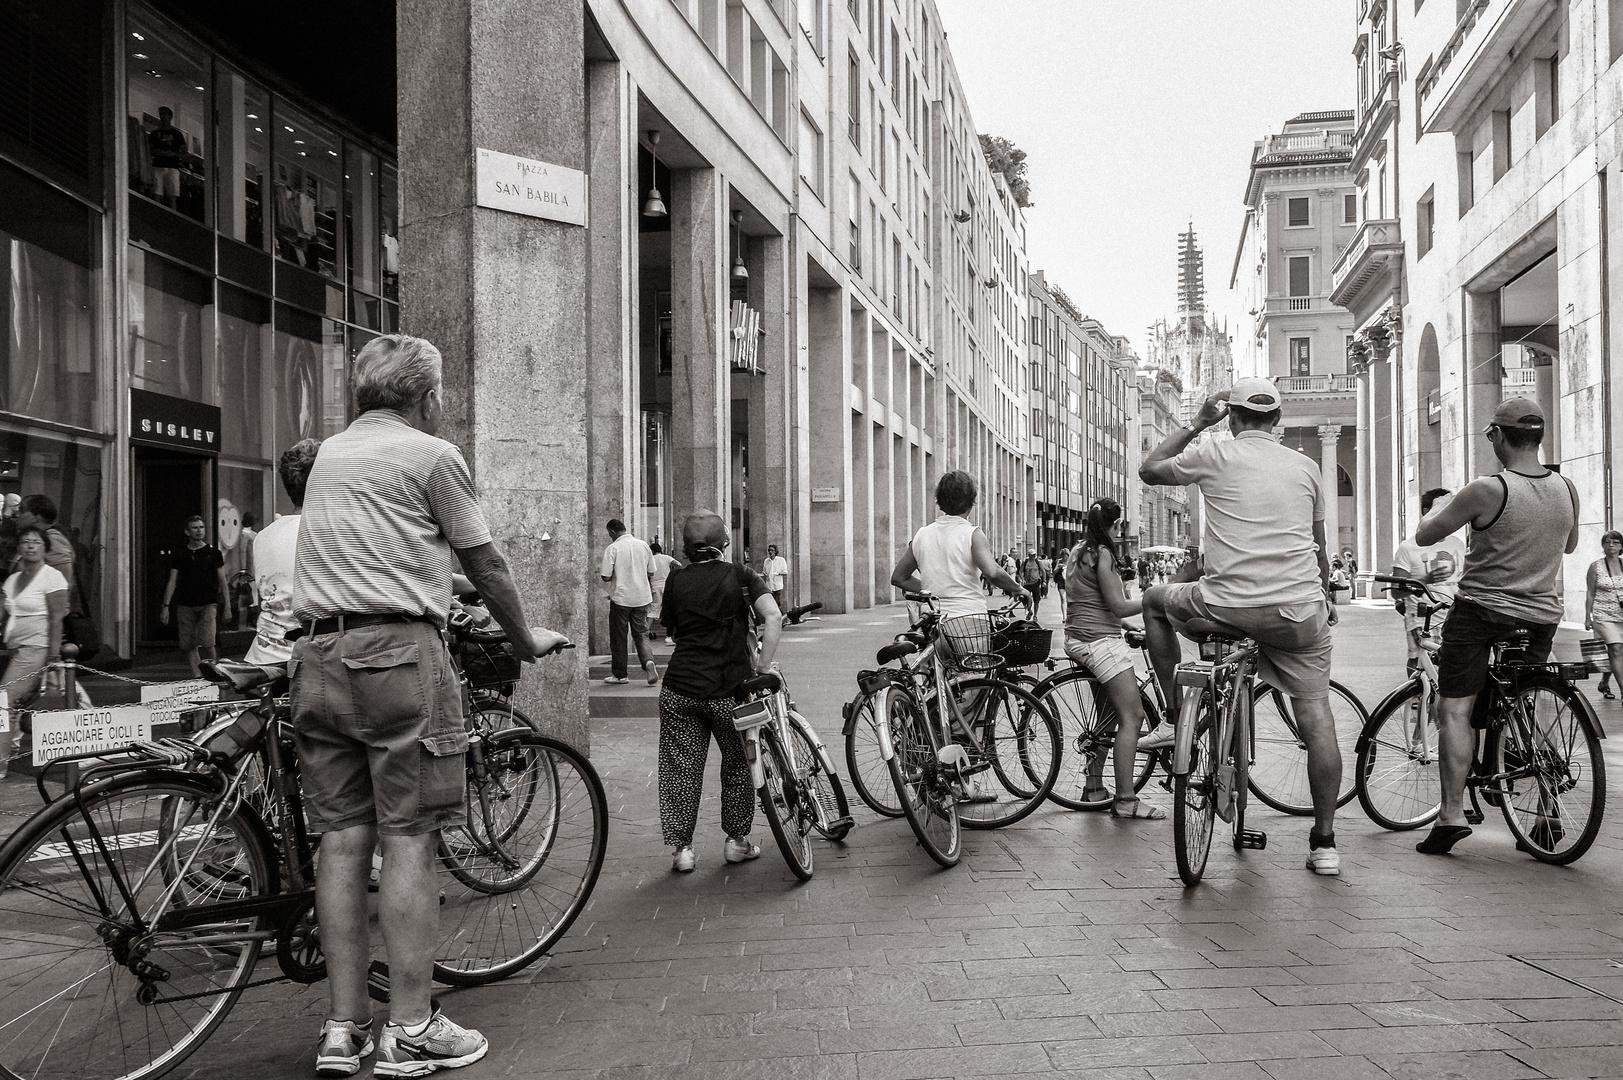 Milano - Fast am Ziel